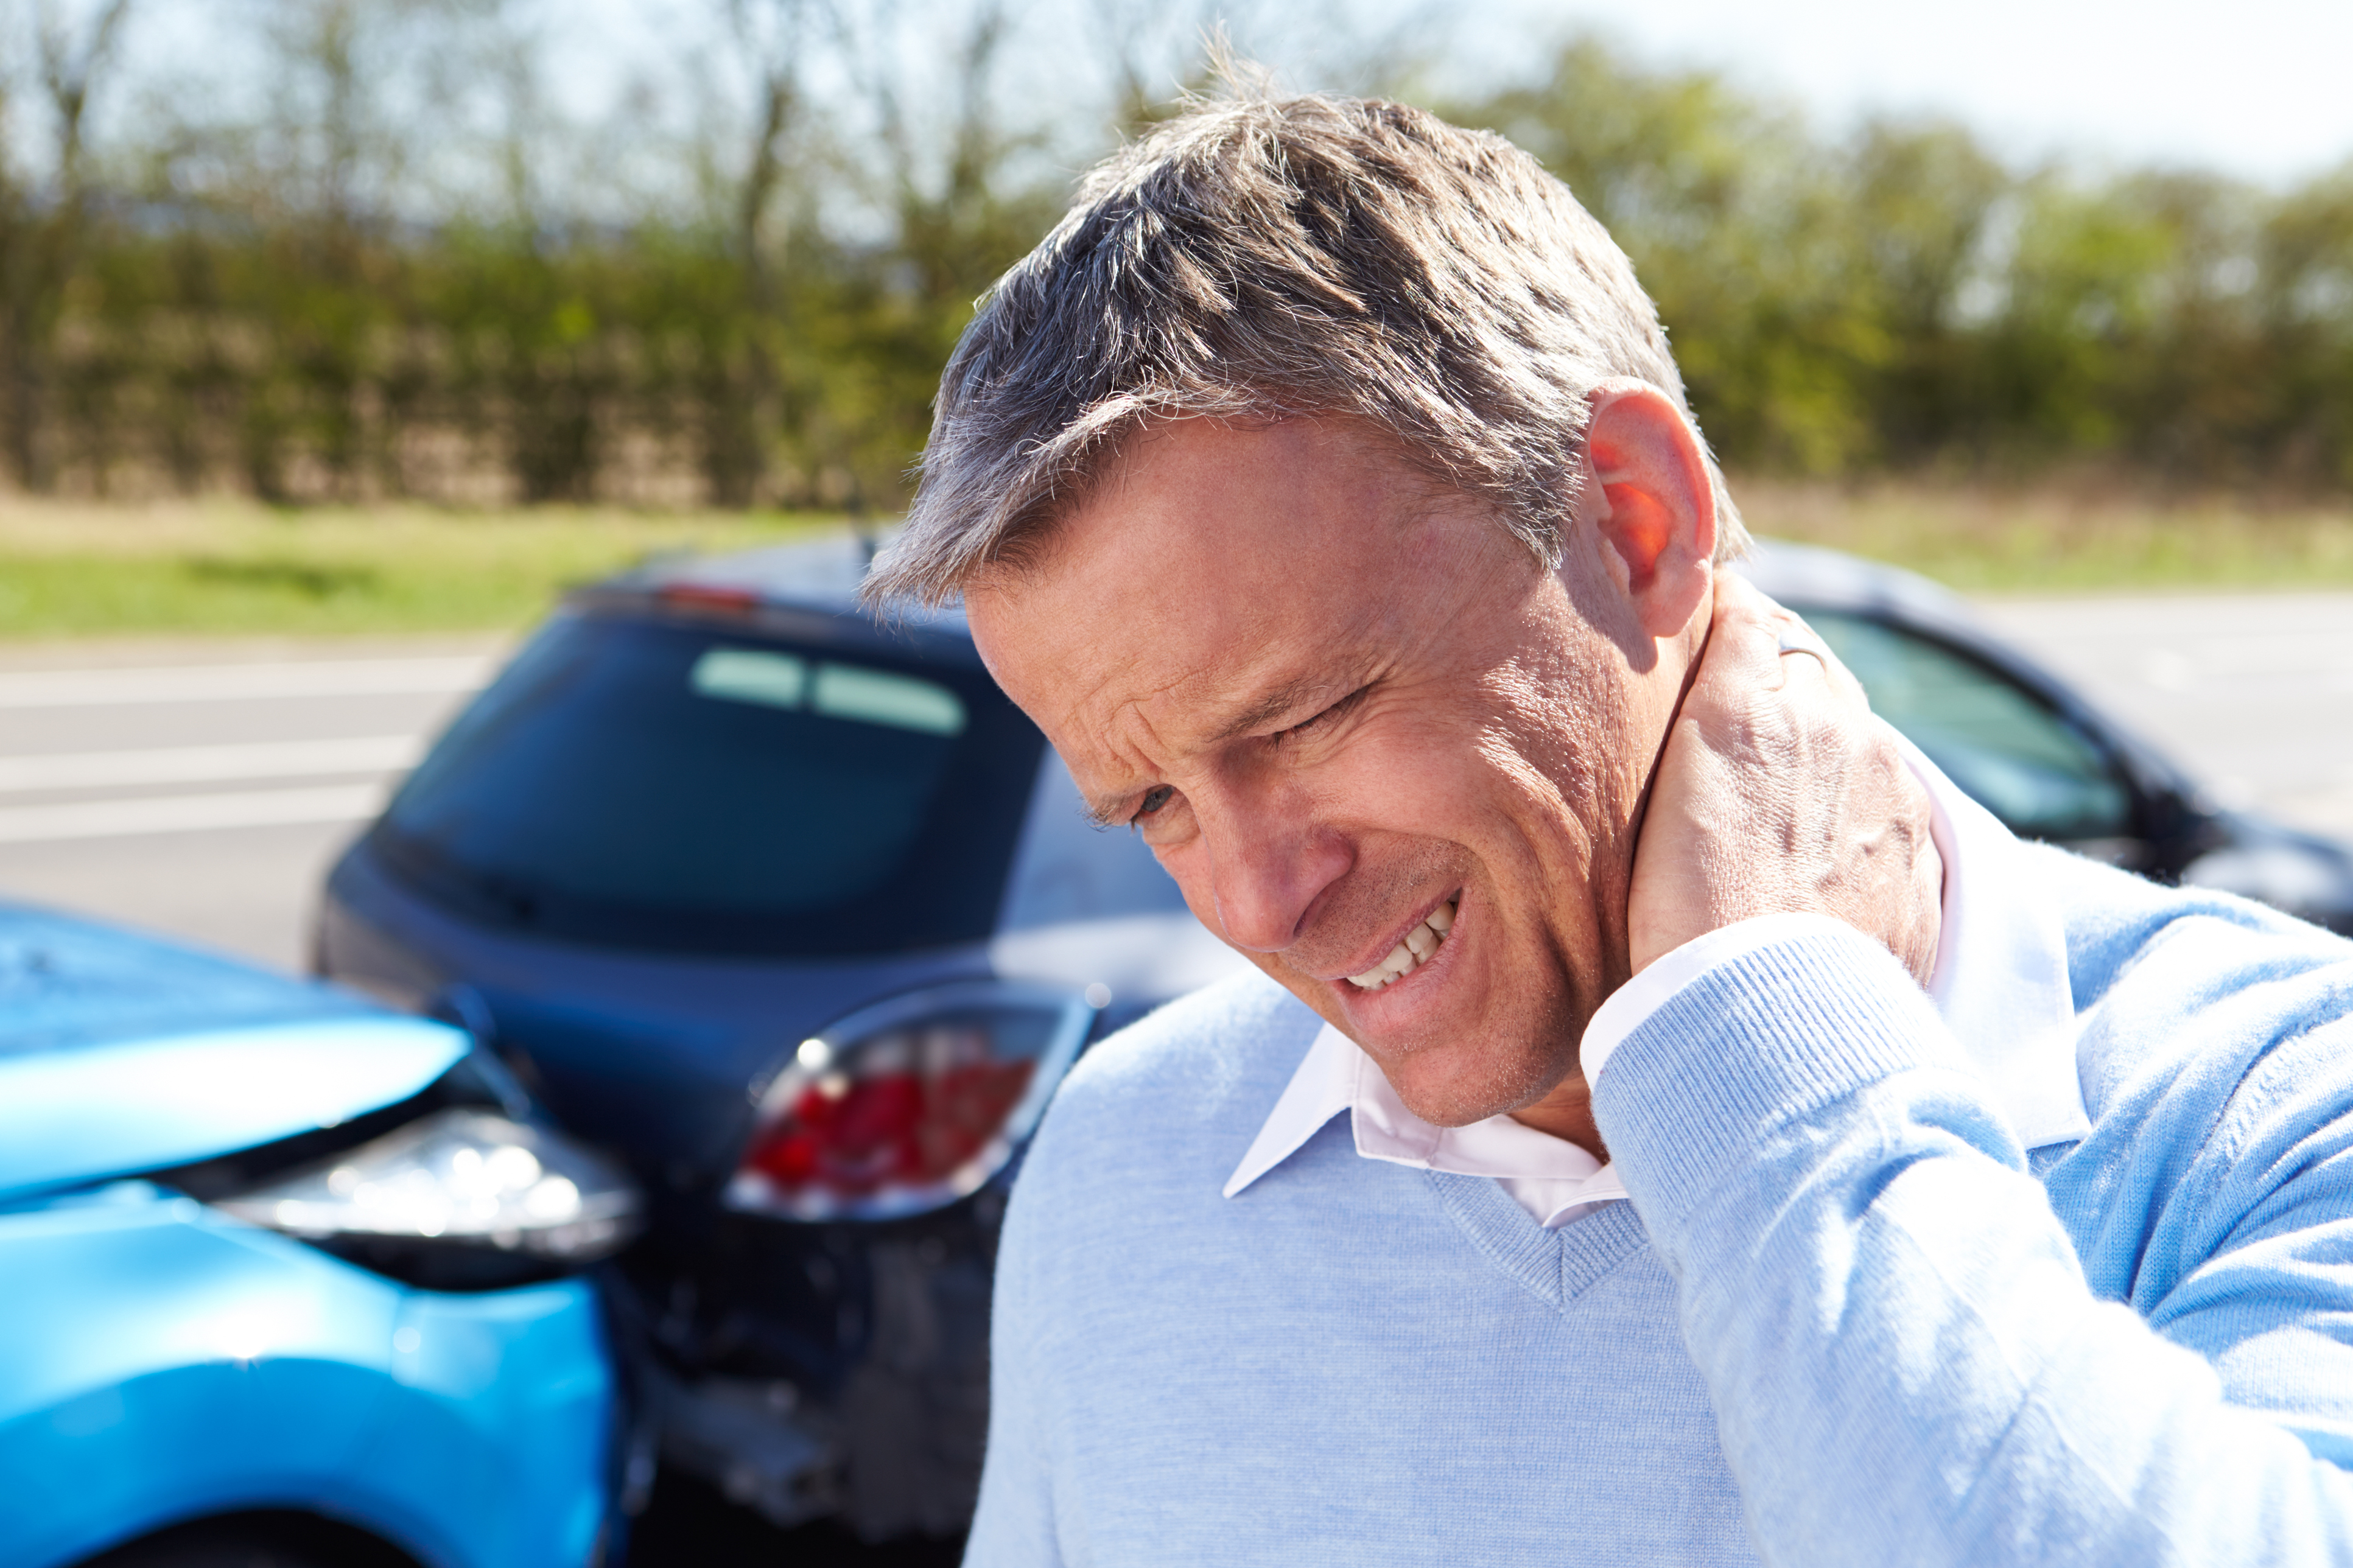 AUTO INJURY TREATMENT